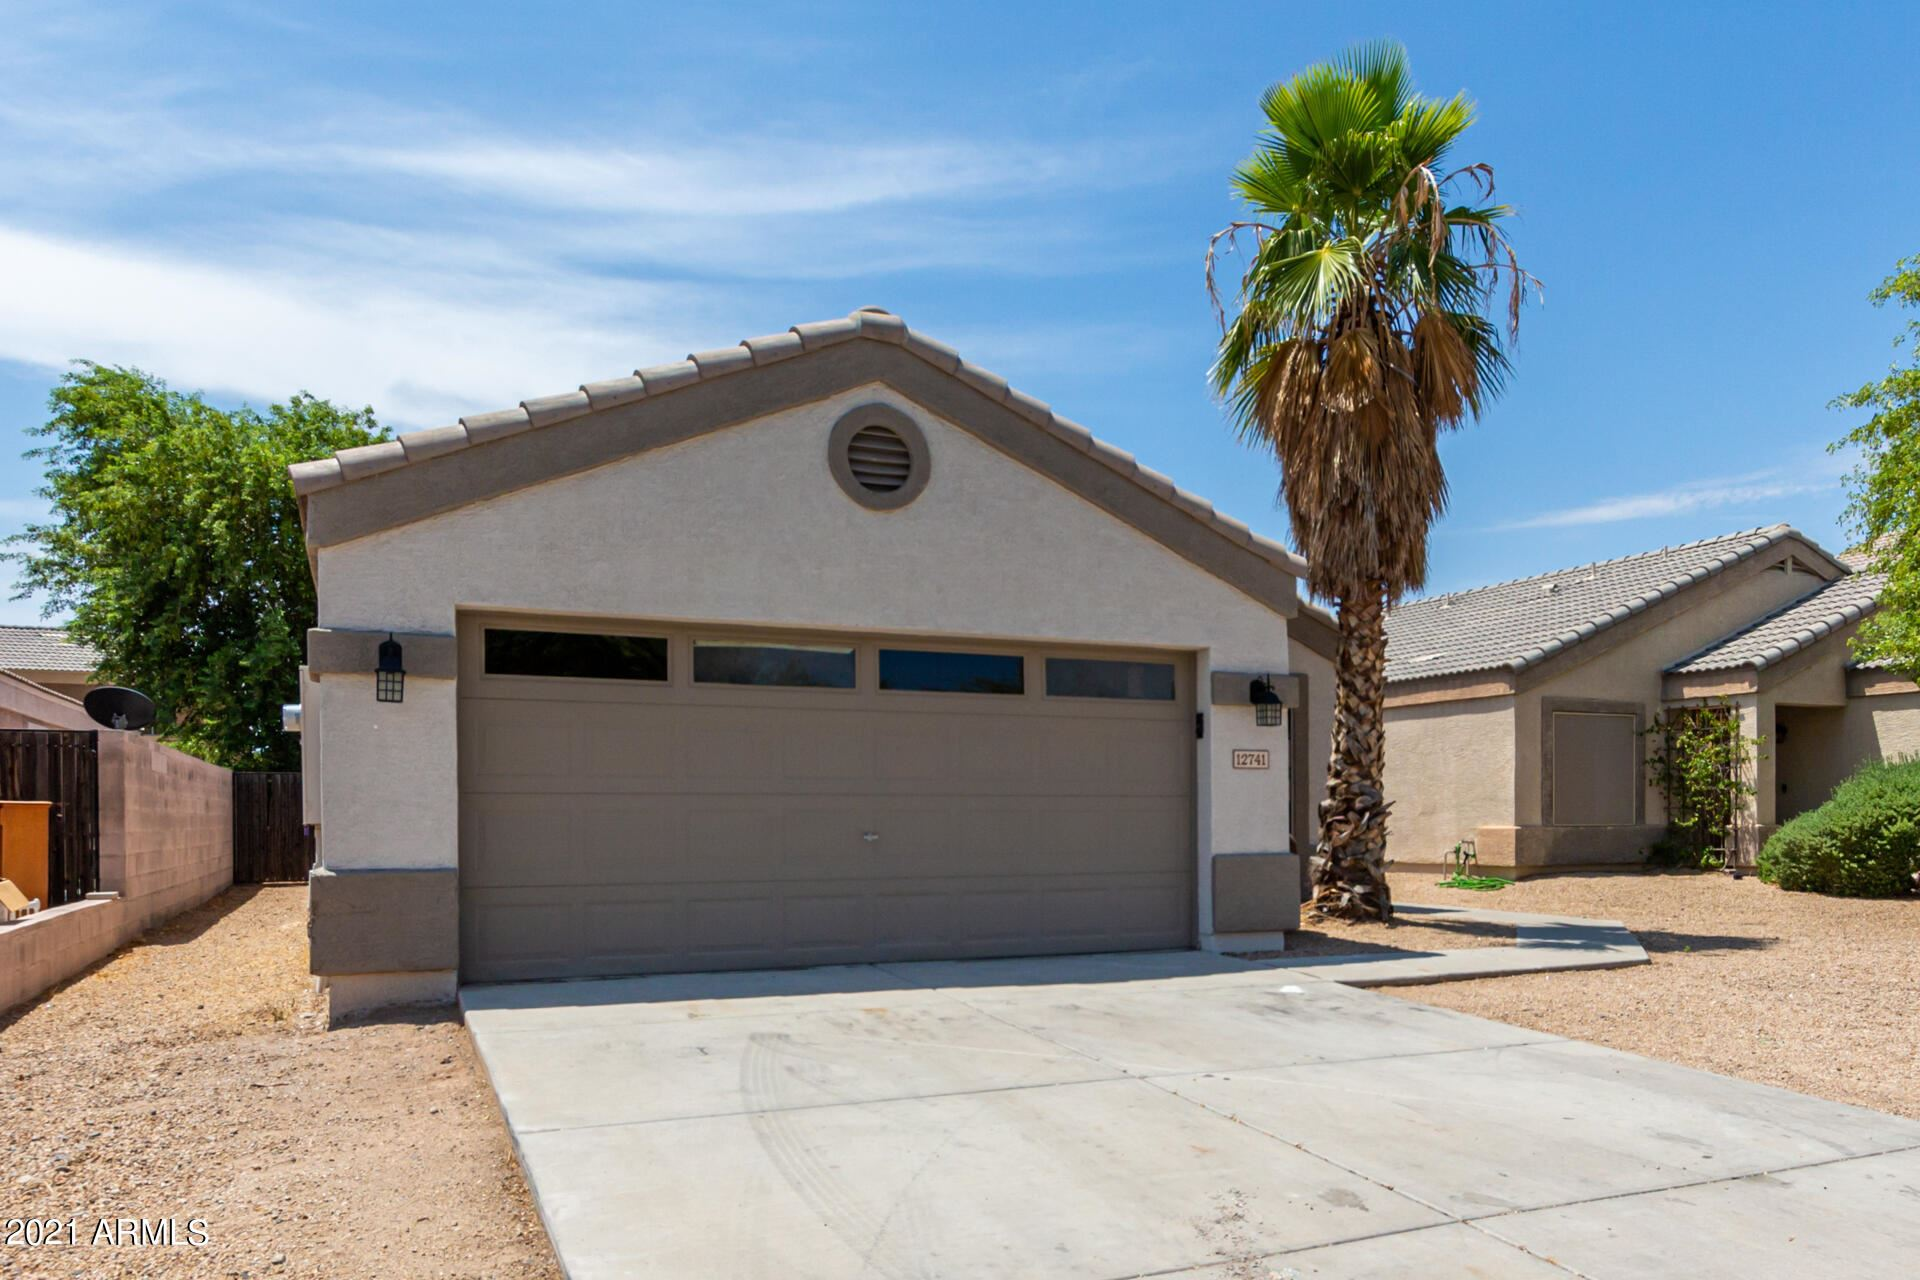 Photo of 12741 W VALENTINE Avenue, El Mirage, AZ 85335 (MLS # 6268035)